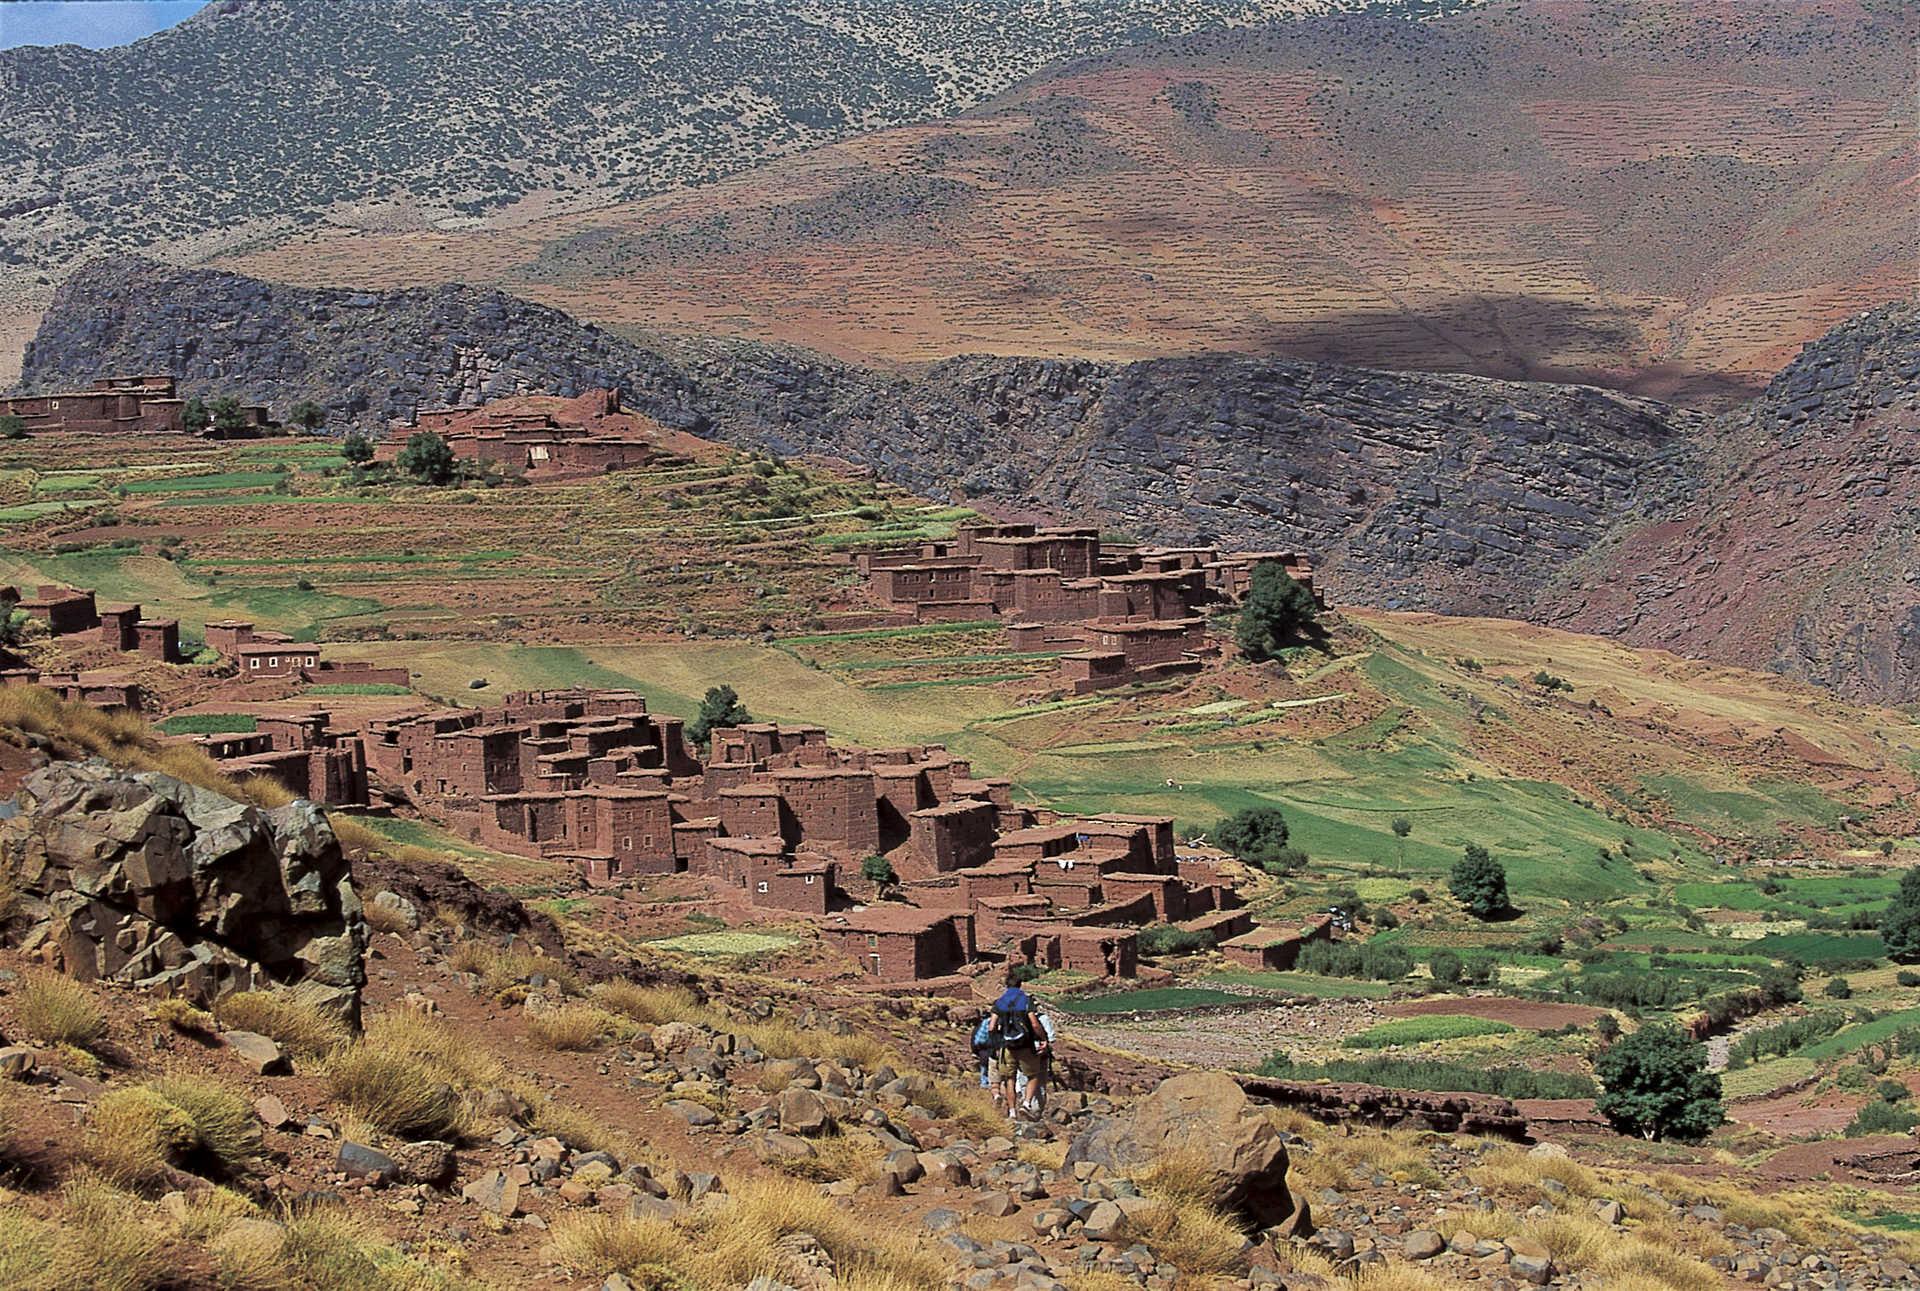 Village de Megdaz, vallée de la Tessaout, Atlas Maroc